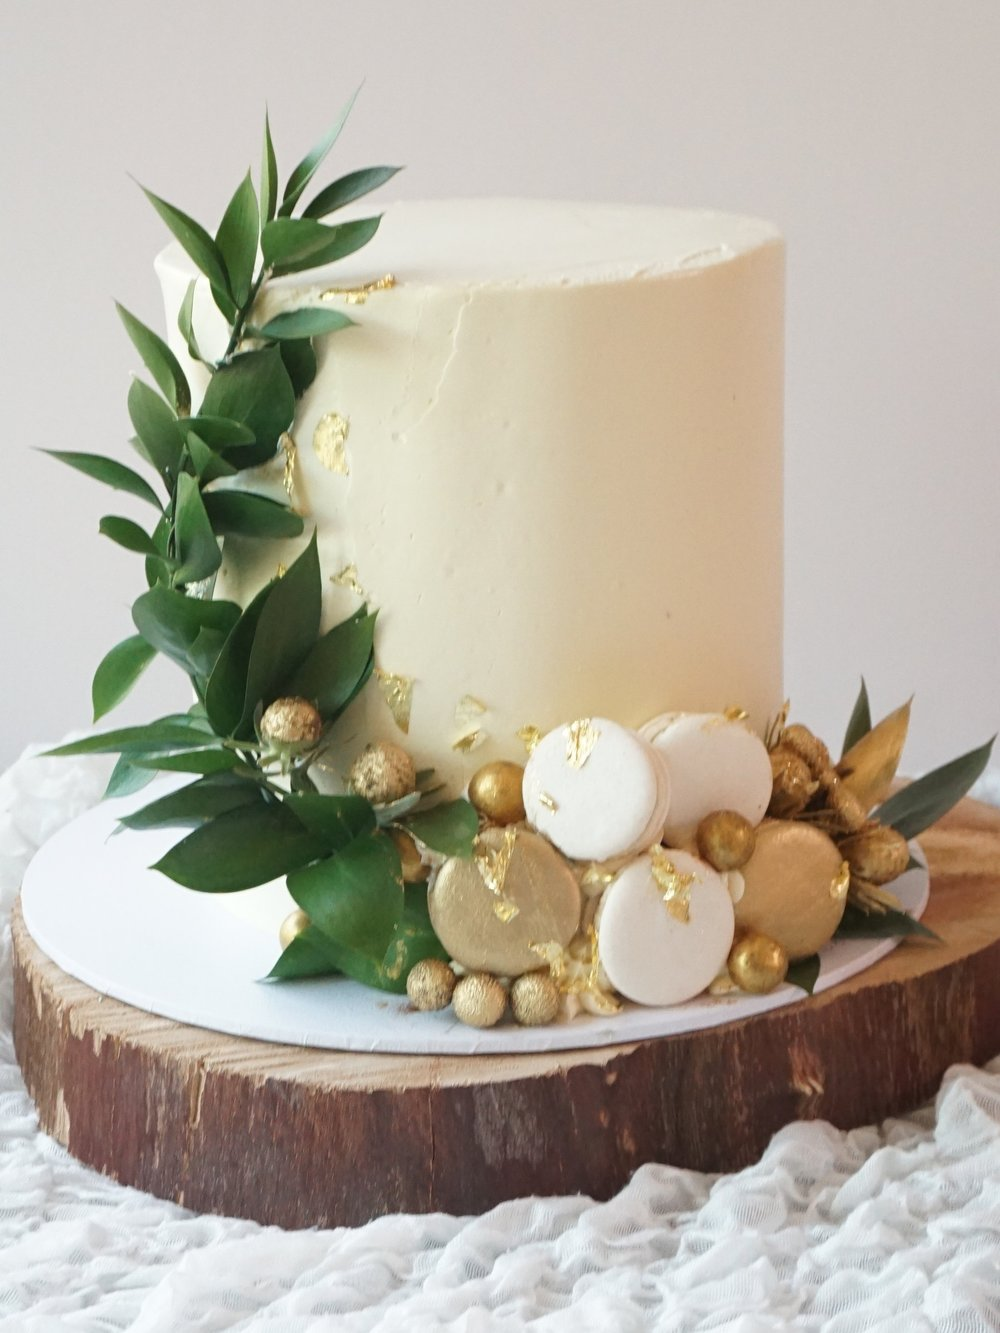 Cakes_By_Aranee_Perth_Drip_Cakes_Custom_Cakes_Wedding_Cakes_Macarons_Cupcakes_Personalised_Cookies_CAKES_Gallery14.jpg